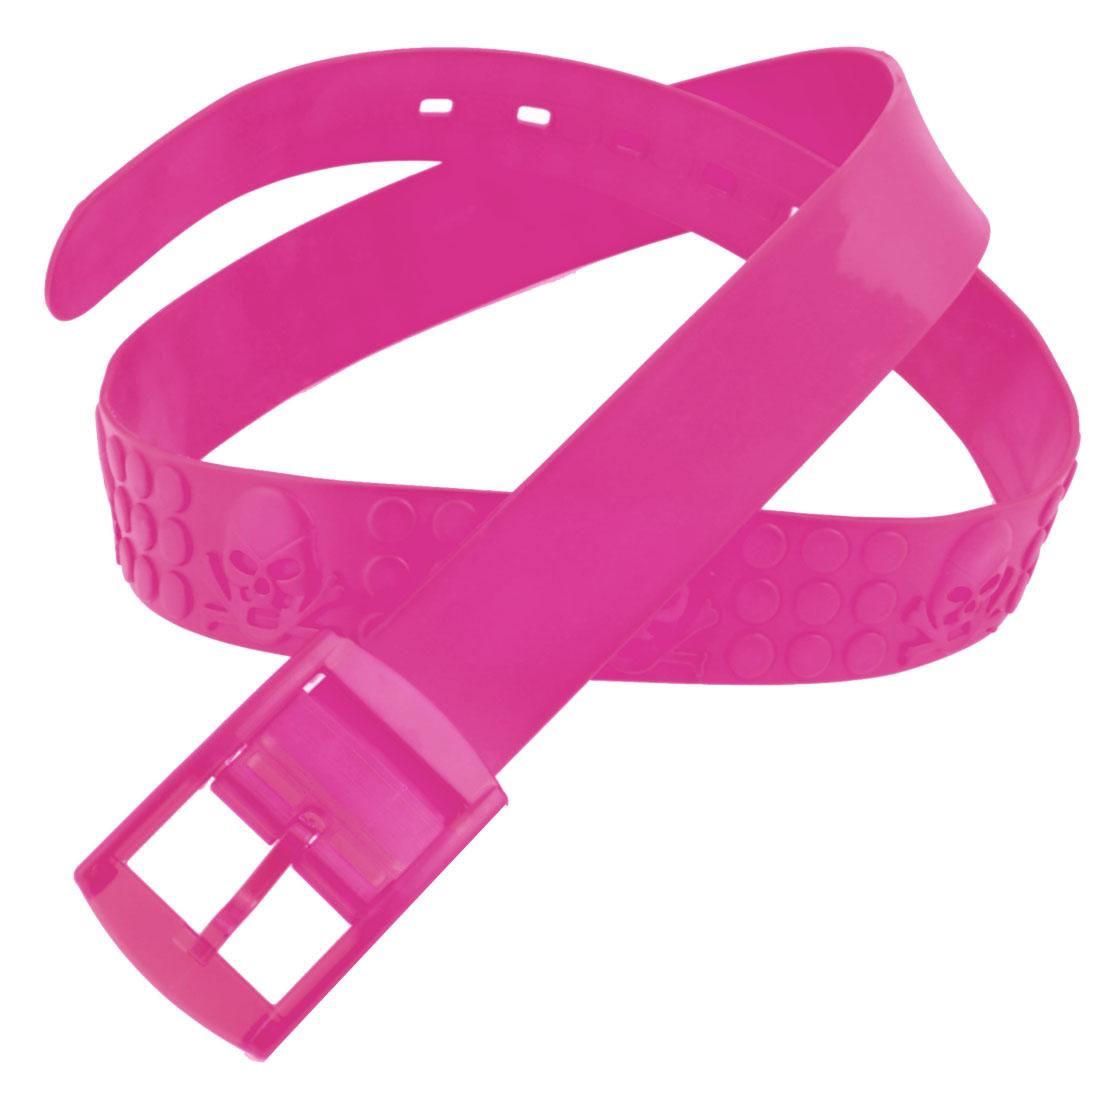 Silicone Adjustable 5 Hole Band Jelly Fragrant Waist Belt Fuchsia for Women